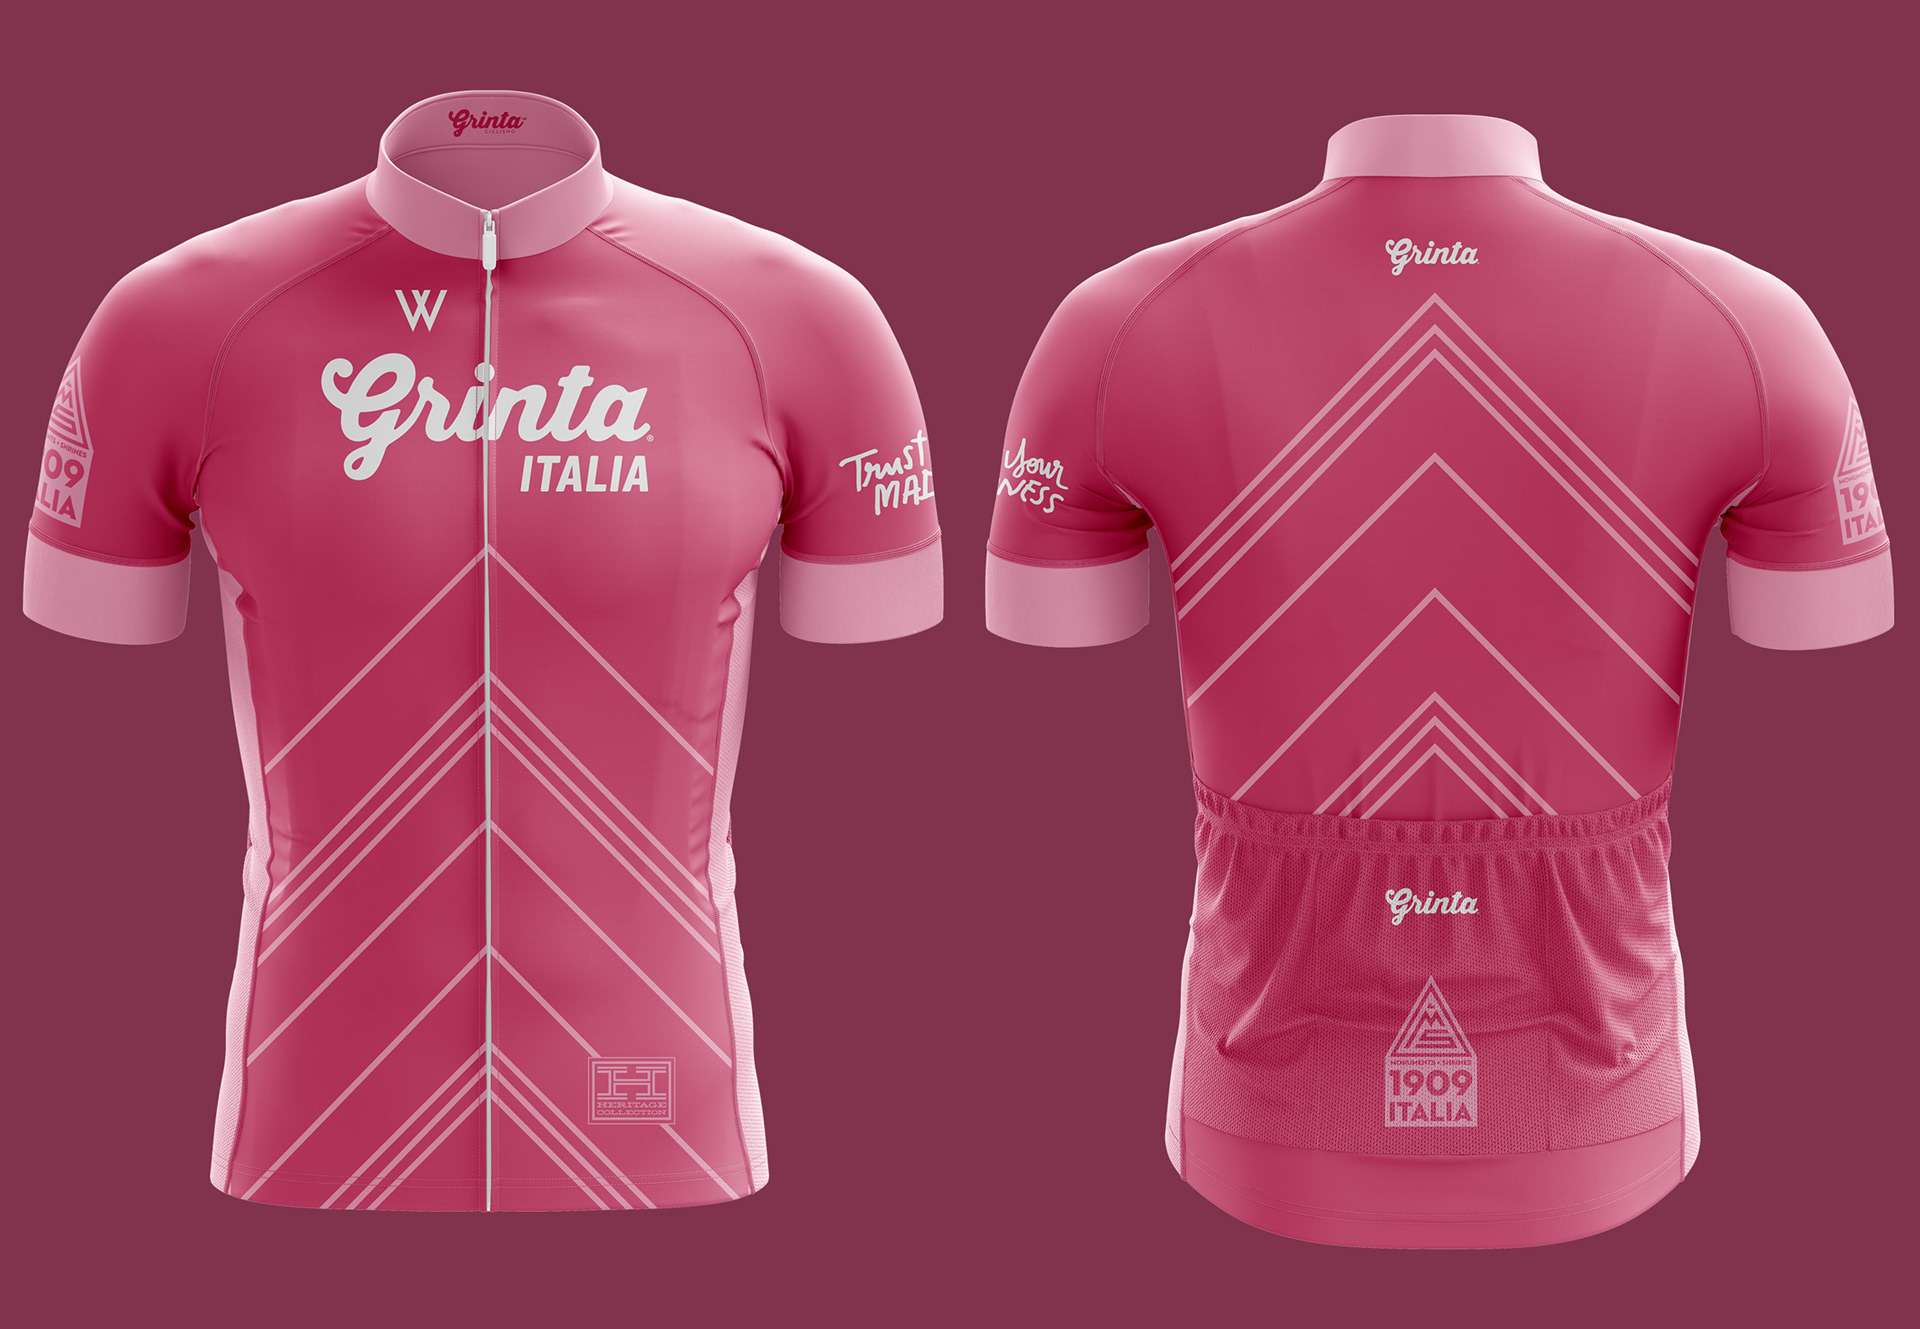 grinta-jerseys-pink-italian-giro.jpg